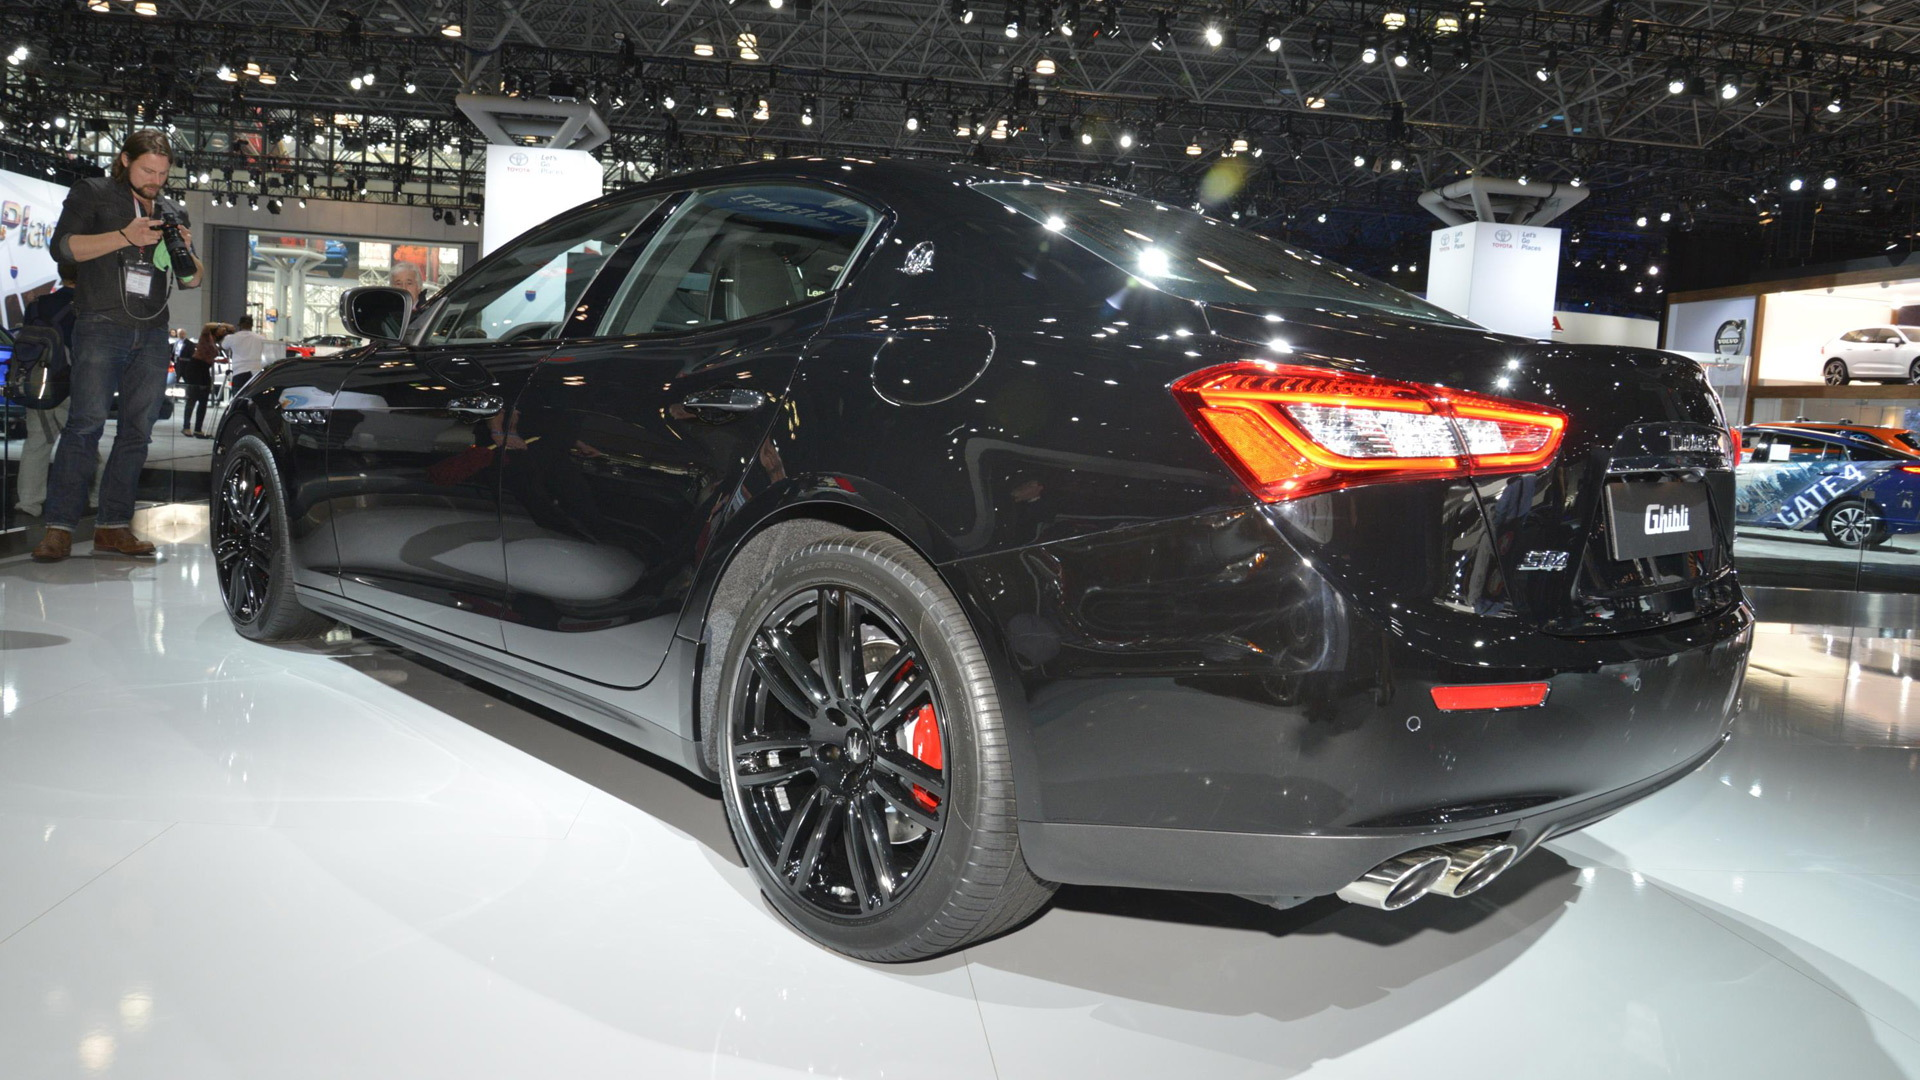 2017 Maserati Ghibli Nerissimo Edition, 2017 New York auto show